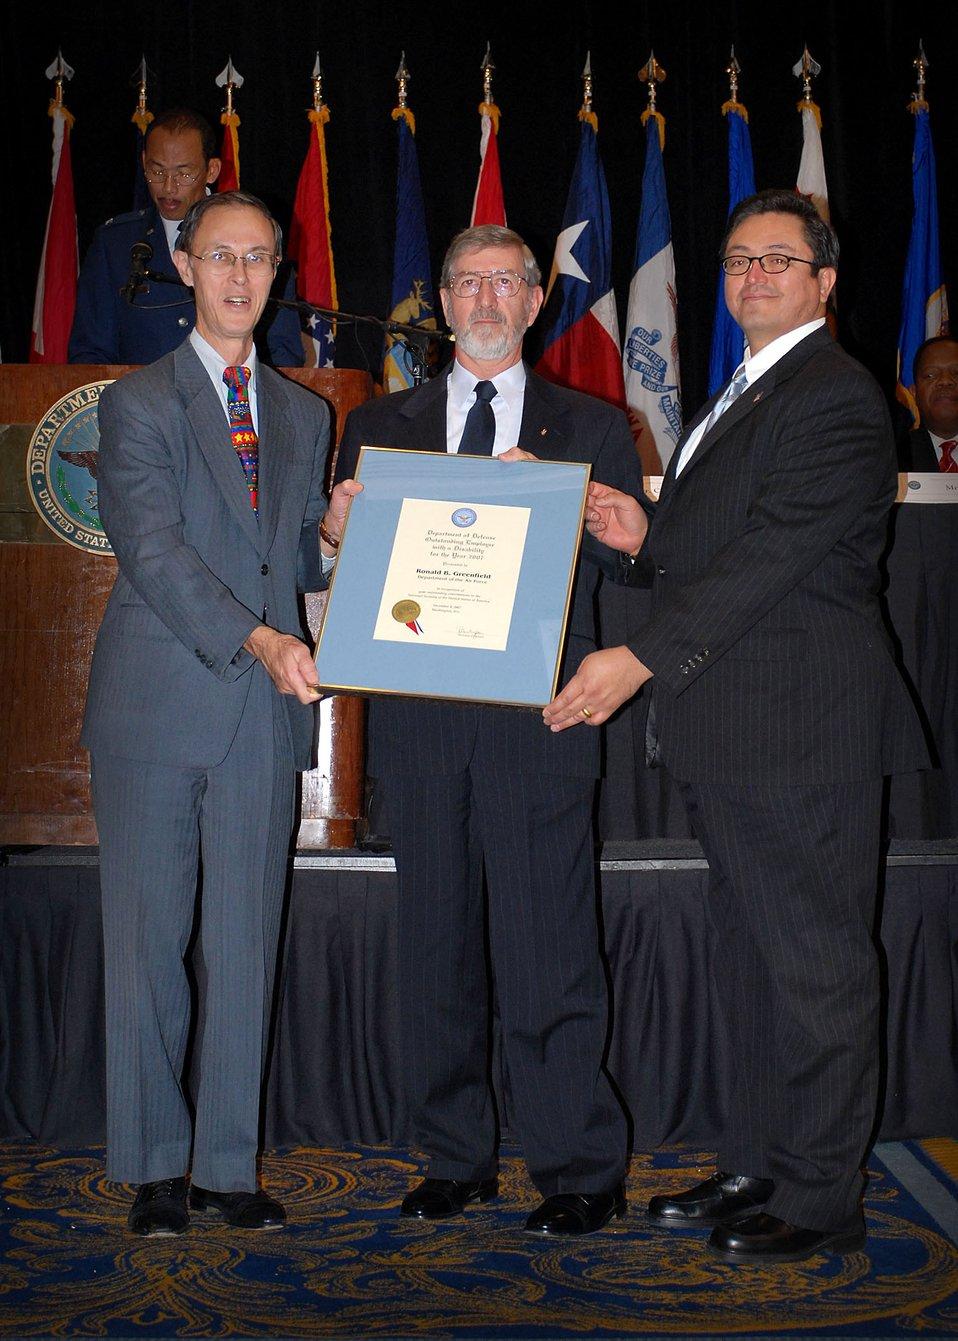 Air Force Receives  Dod Disability Awards Public Domain Mark